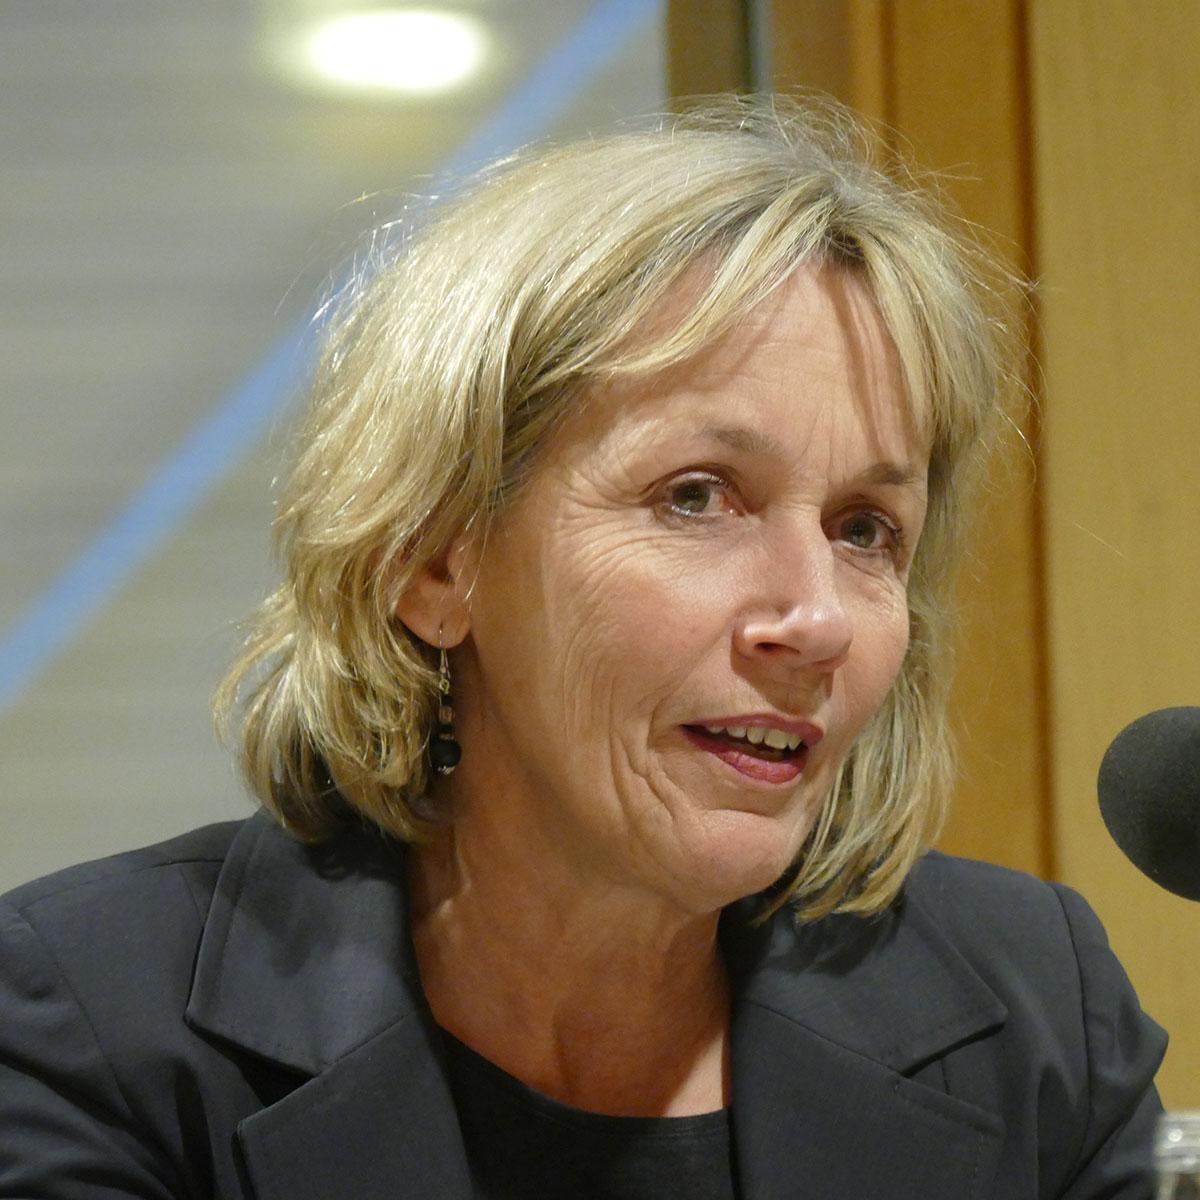 Dagmar Leupold